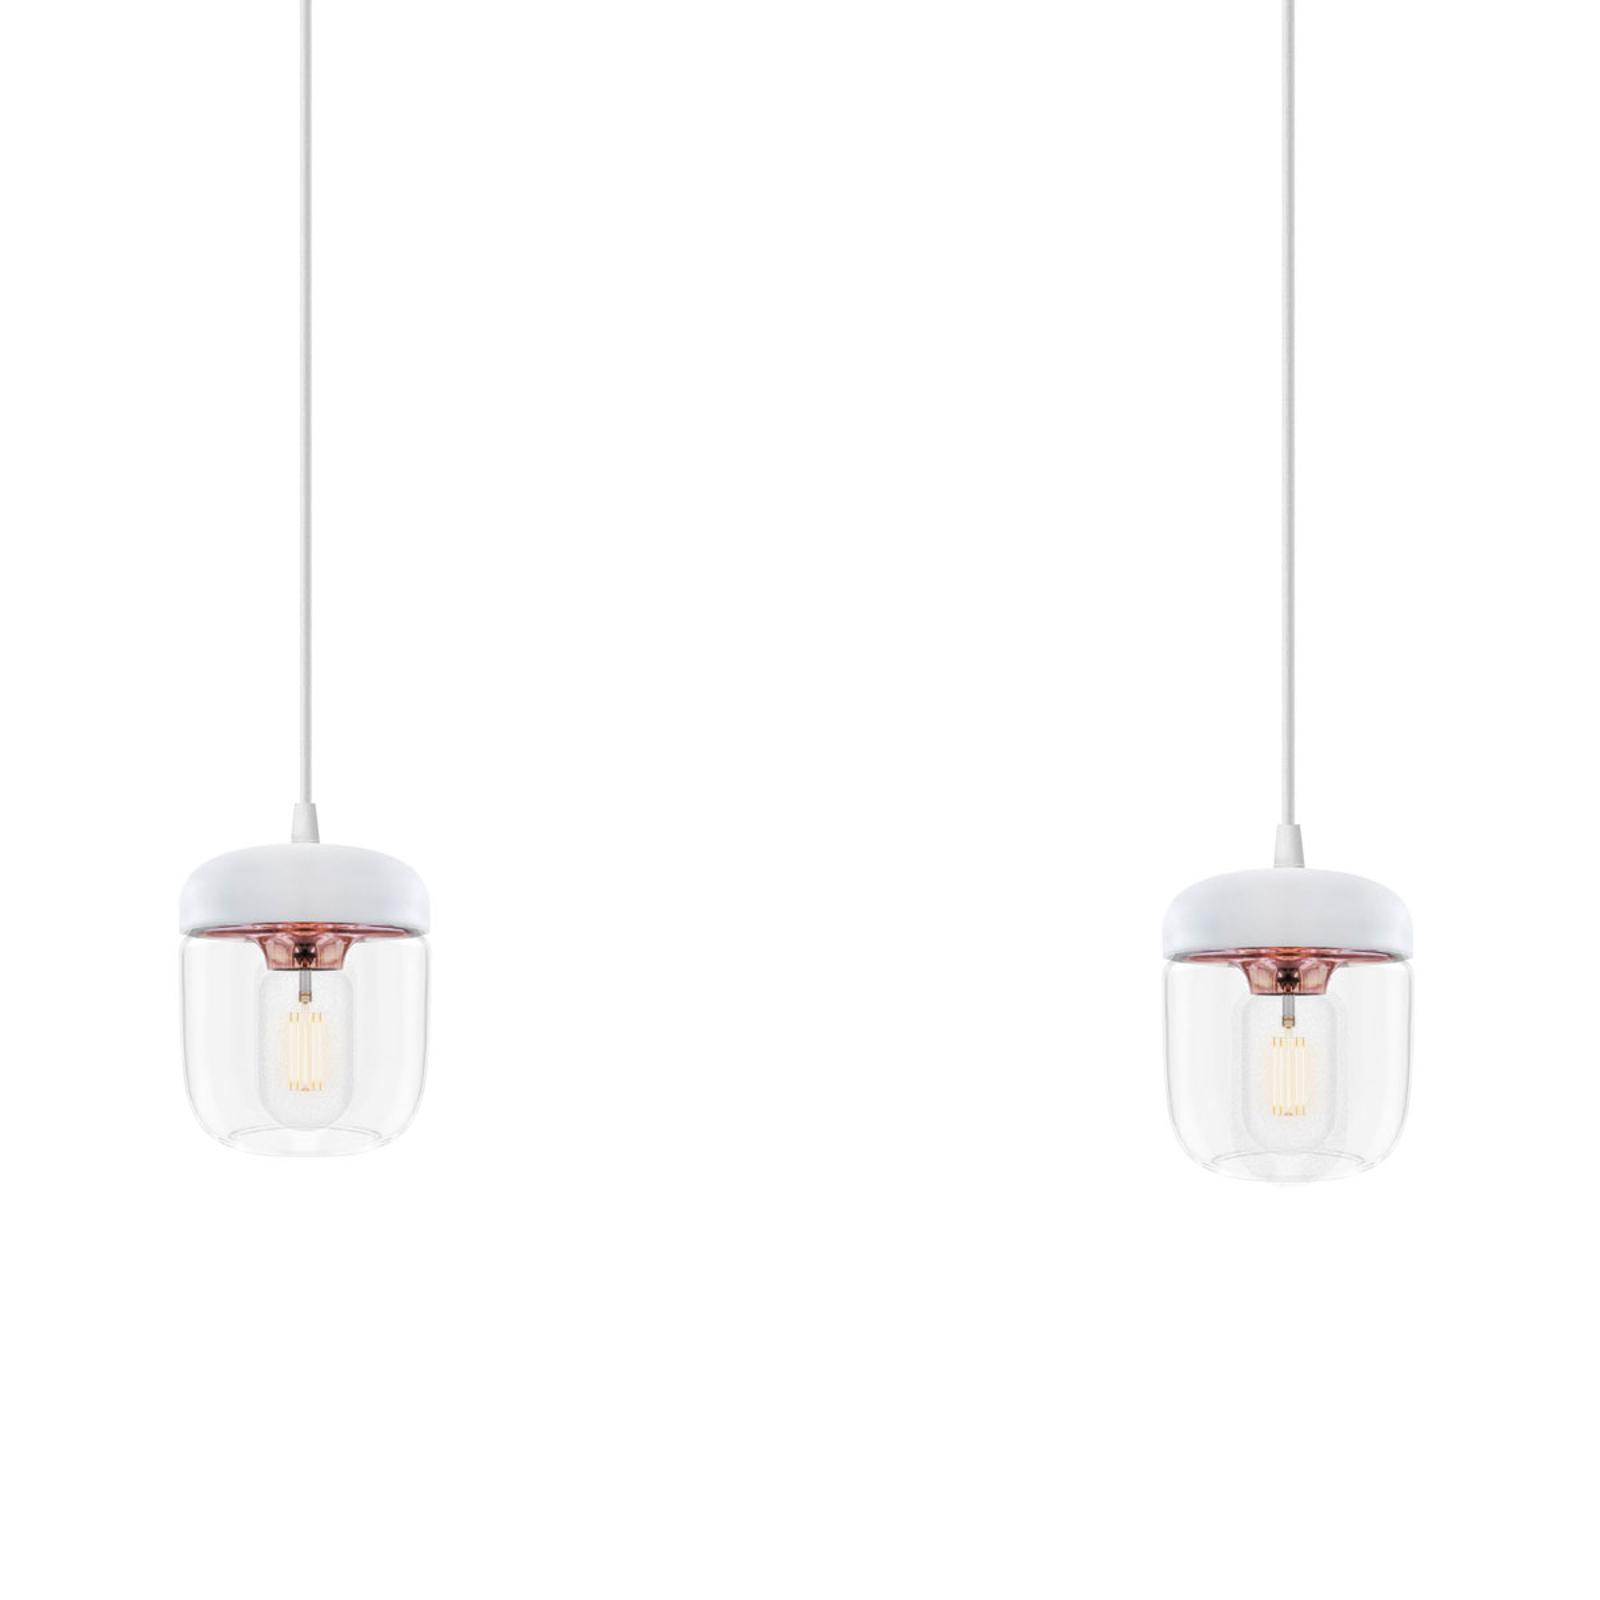 Lampa wisząca Lampa Acorn, 2-punktowa